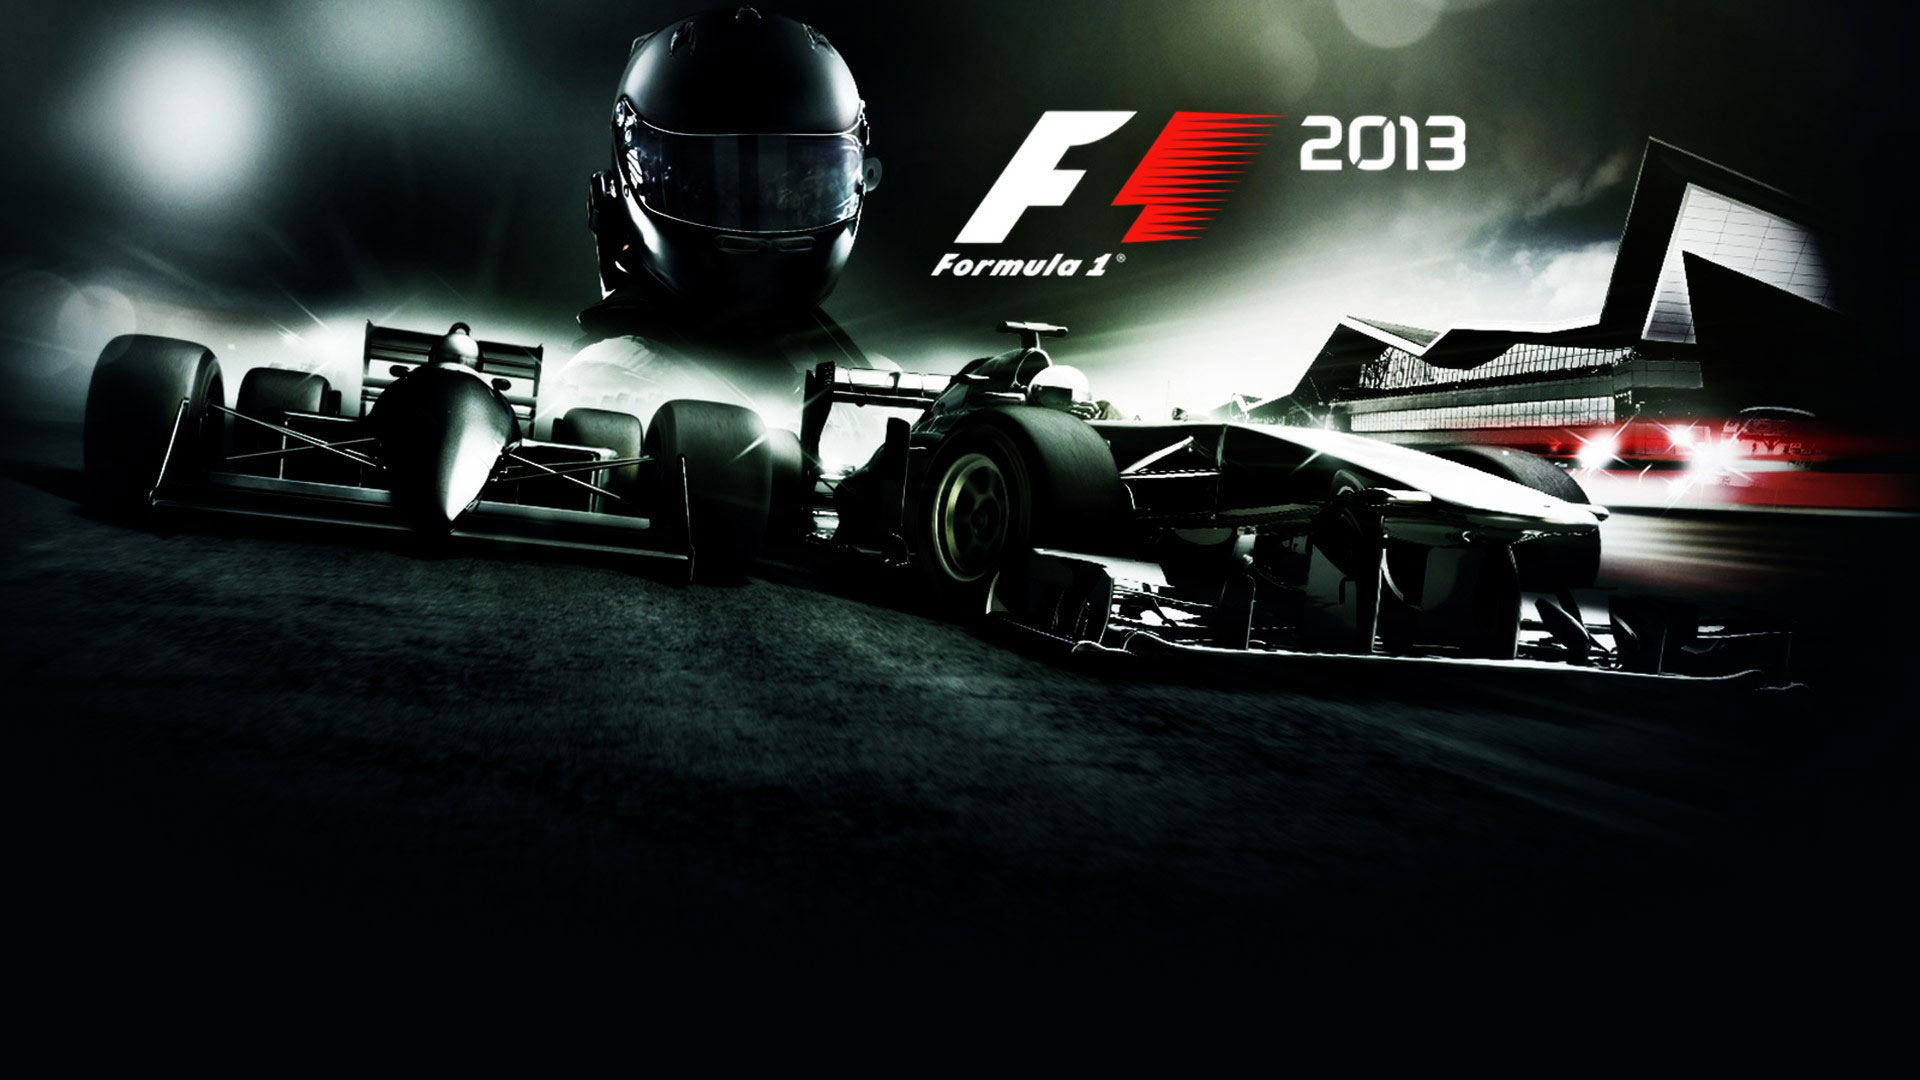 F1 2013高清游戏壁纸发布 全赛车特写高清